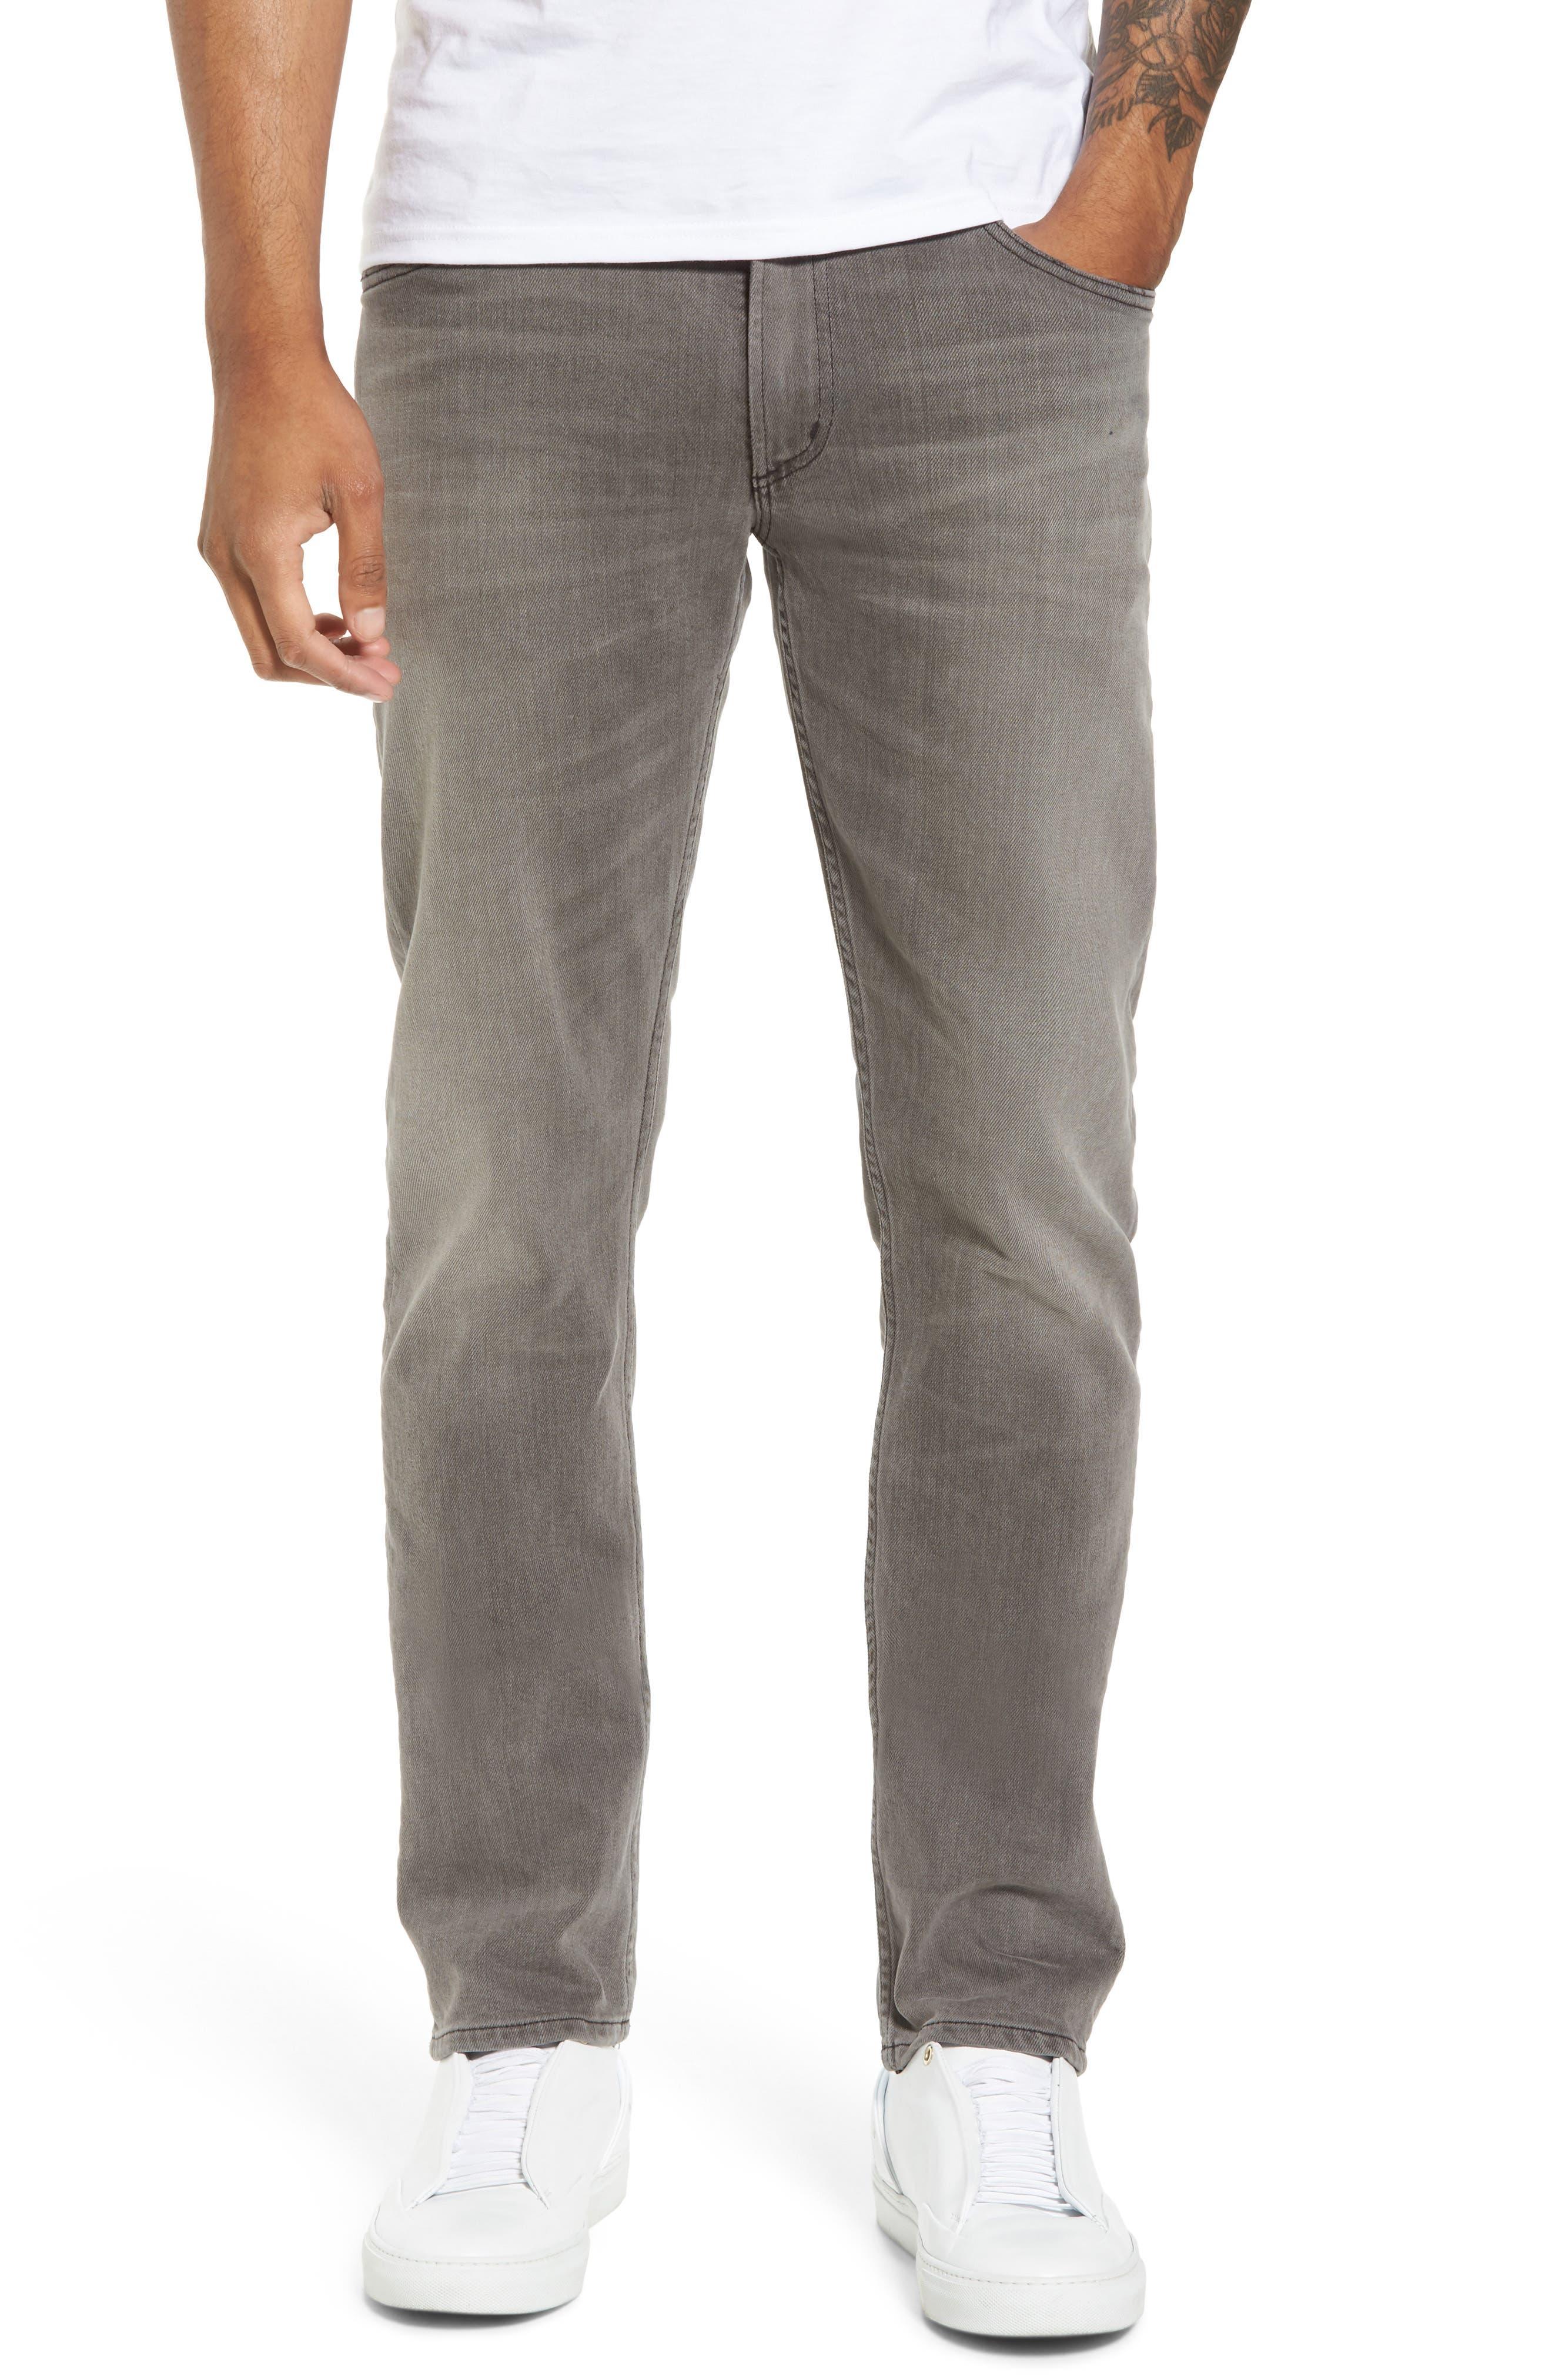 Bowery Slim Fit Jeans,                         Main,                         color, Leon